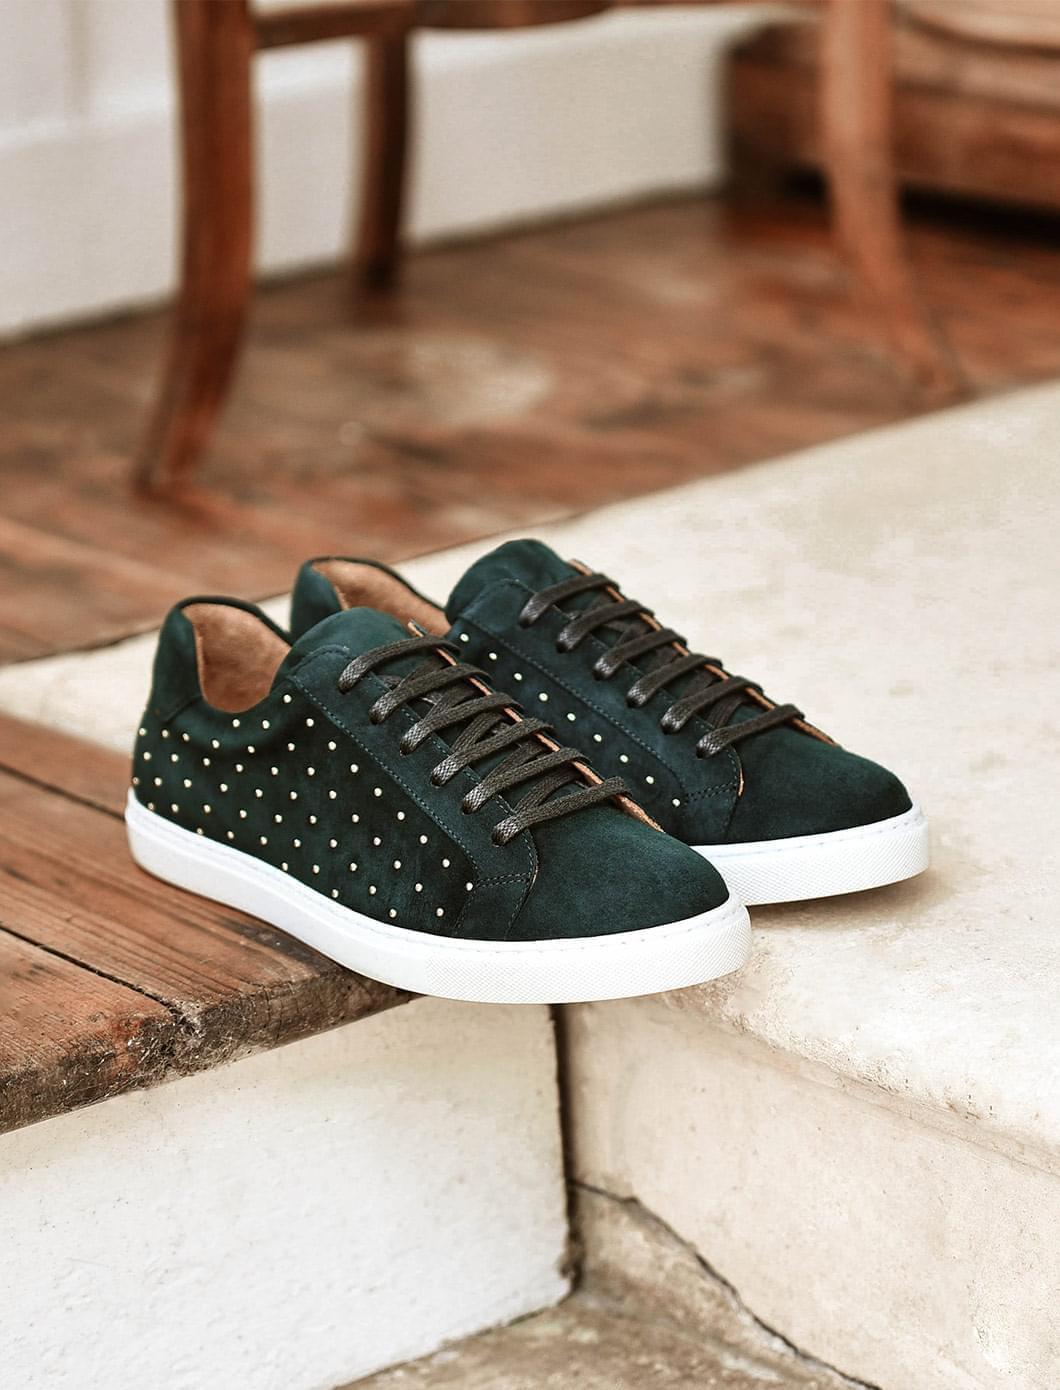 Sneakers - Vert sapin et rivets dorés